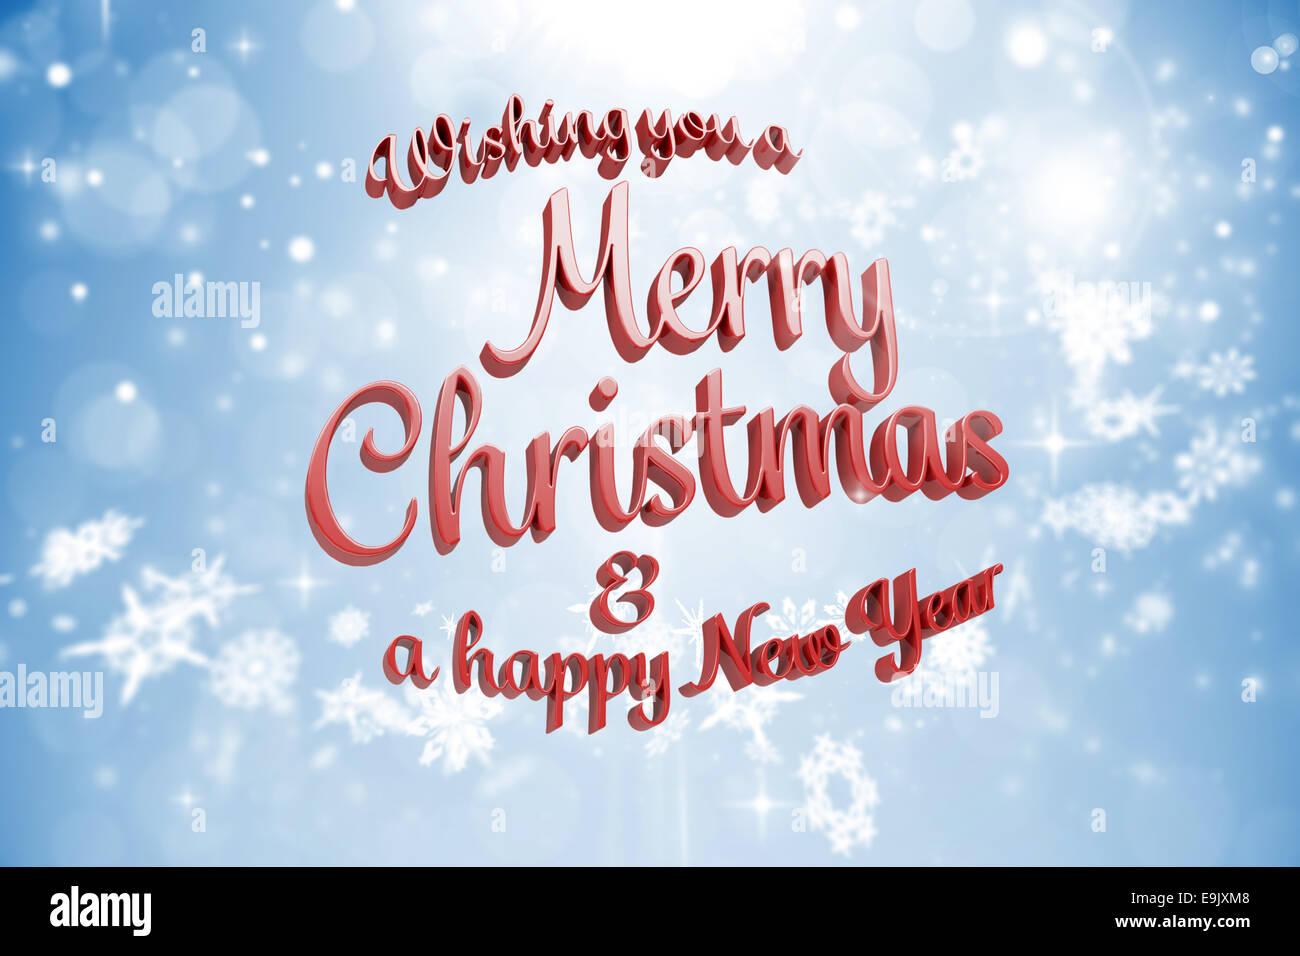 Merry Christmas Text Message Stock Photos & Merry Christmas Text ...